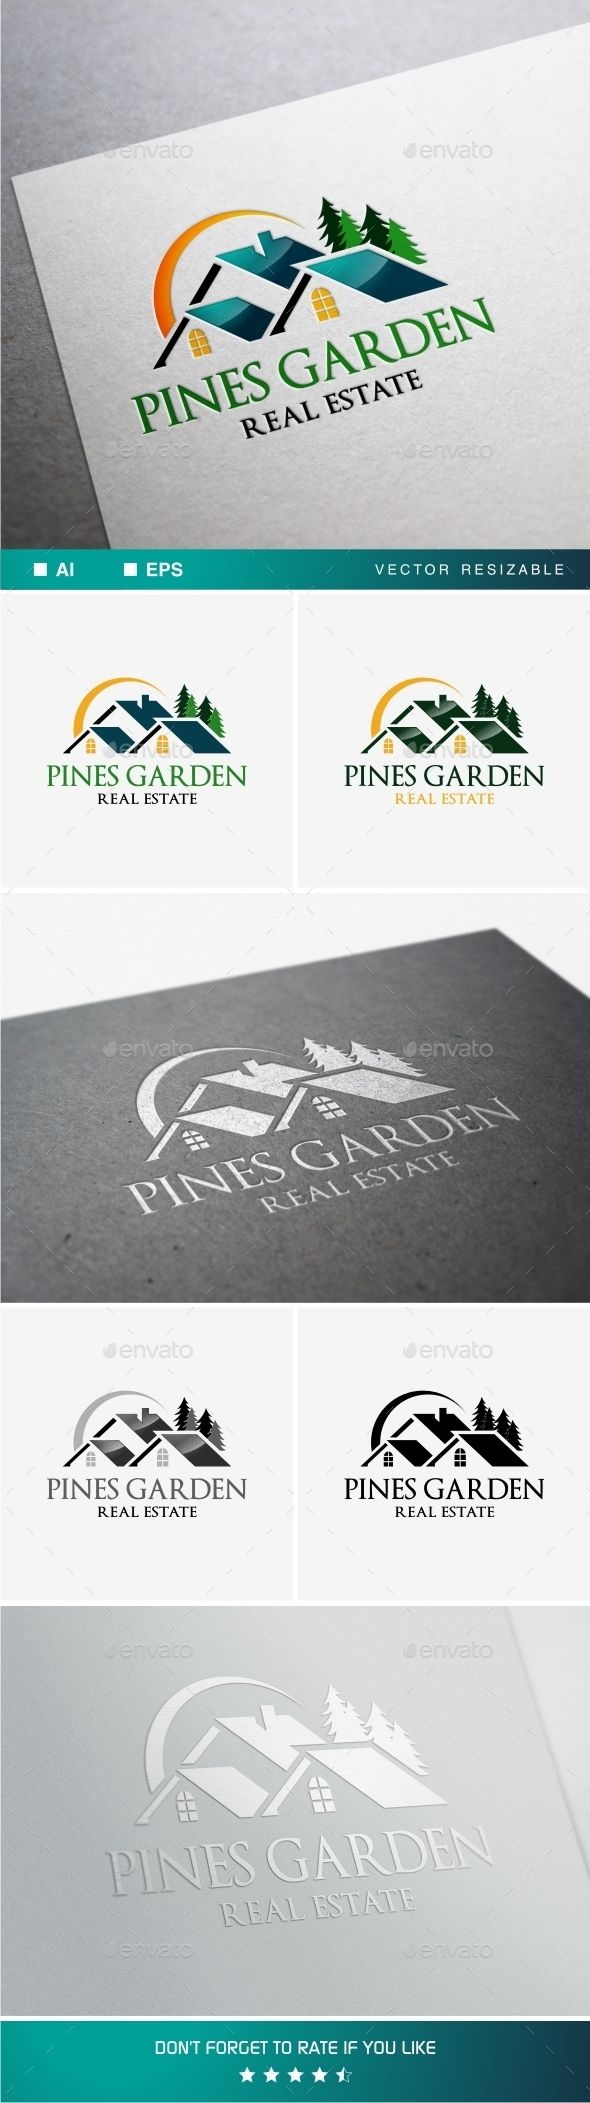 Pines Garden Real Estate Logo Design Template Vector #logotype Download it here:  http://graphicriver.net/item/pines-garden-real-estate-/11265331?s_rank=1712?ref=nesto